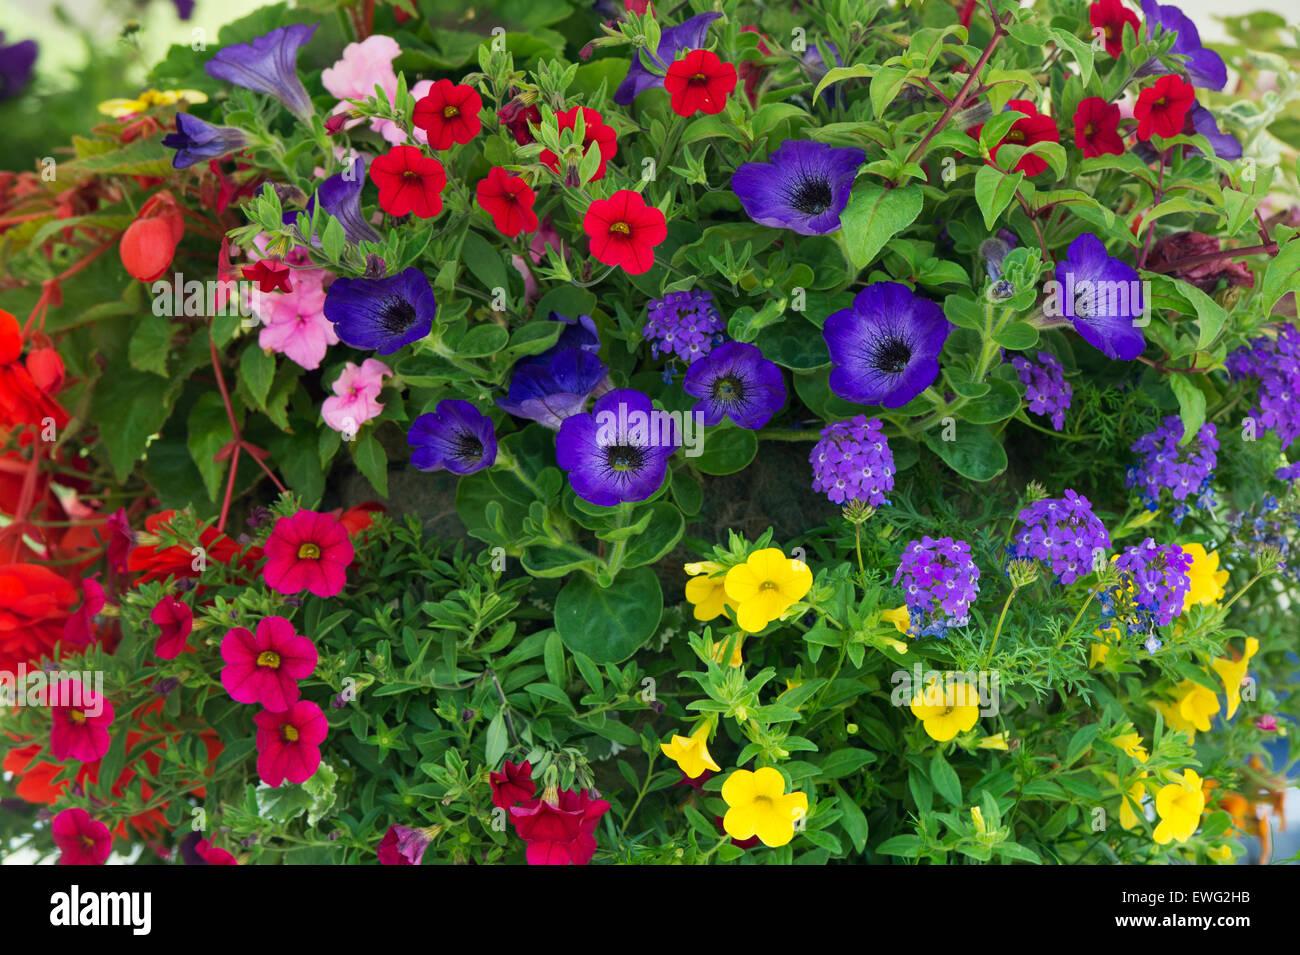 Calibrachoa. Petunia Million Bells flowers in a hanging basket - Stock Image